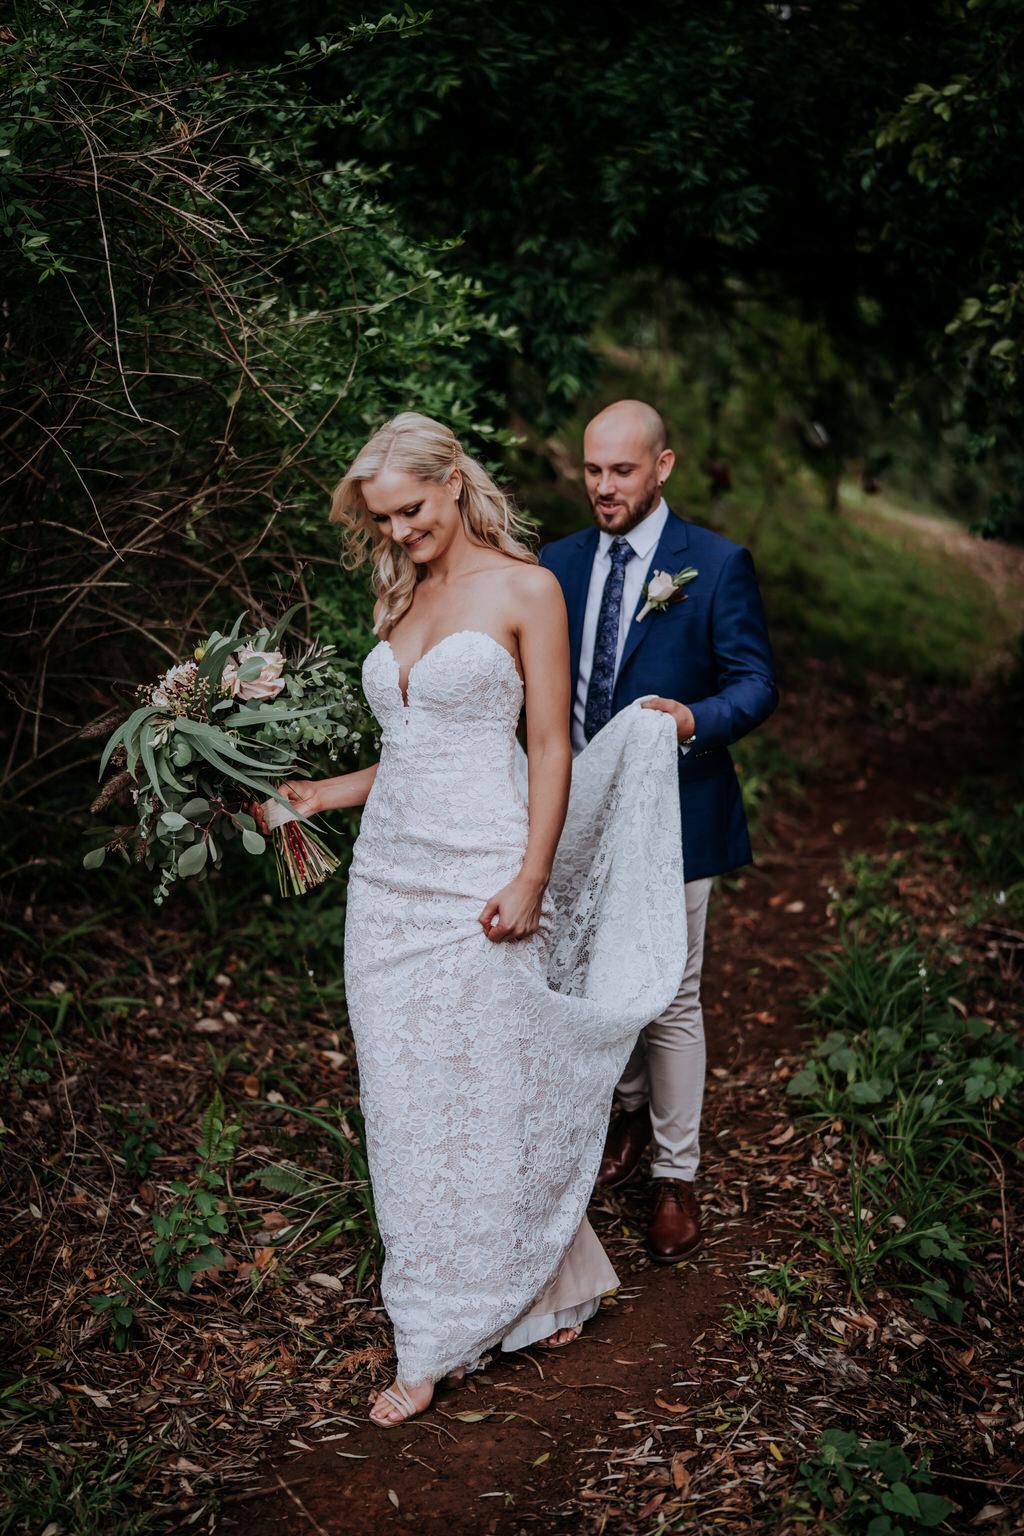 ava-me-photography-jade-simon-loxley-bellbird-hill-kurrajong-heights-wedding-680